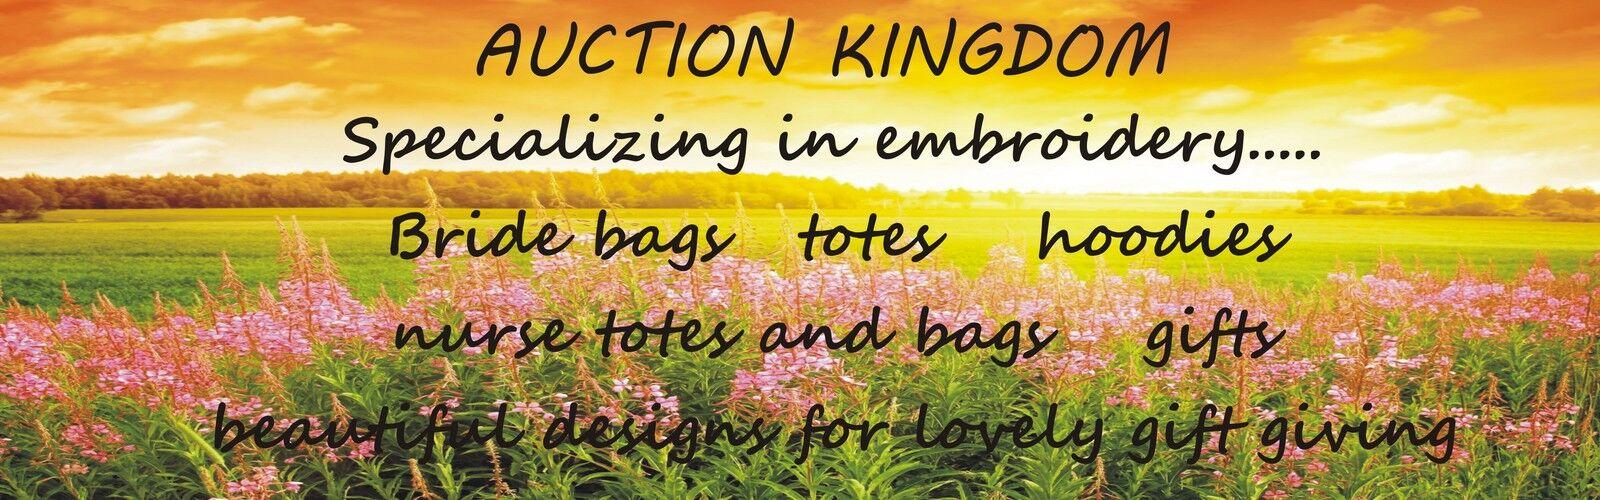 Auction Kingdom